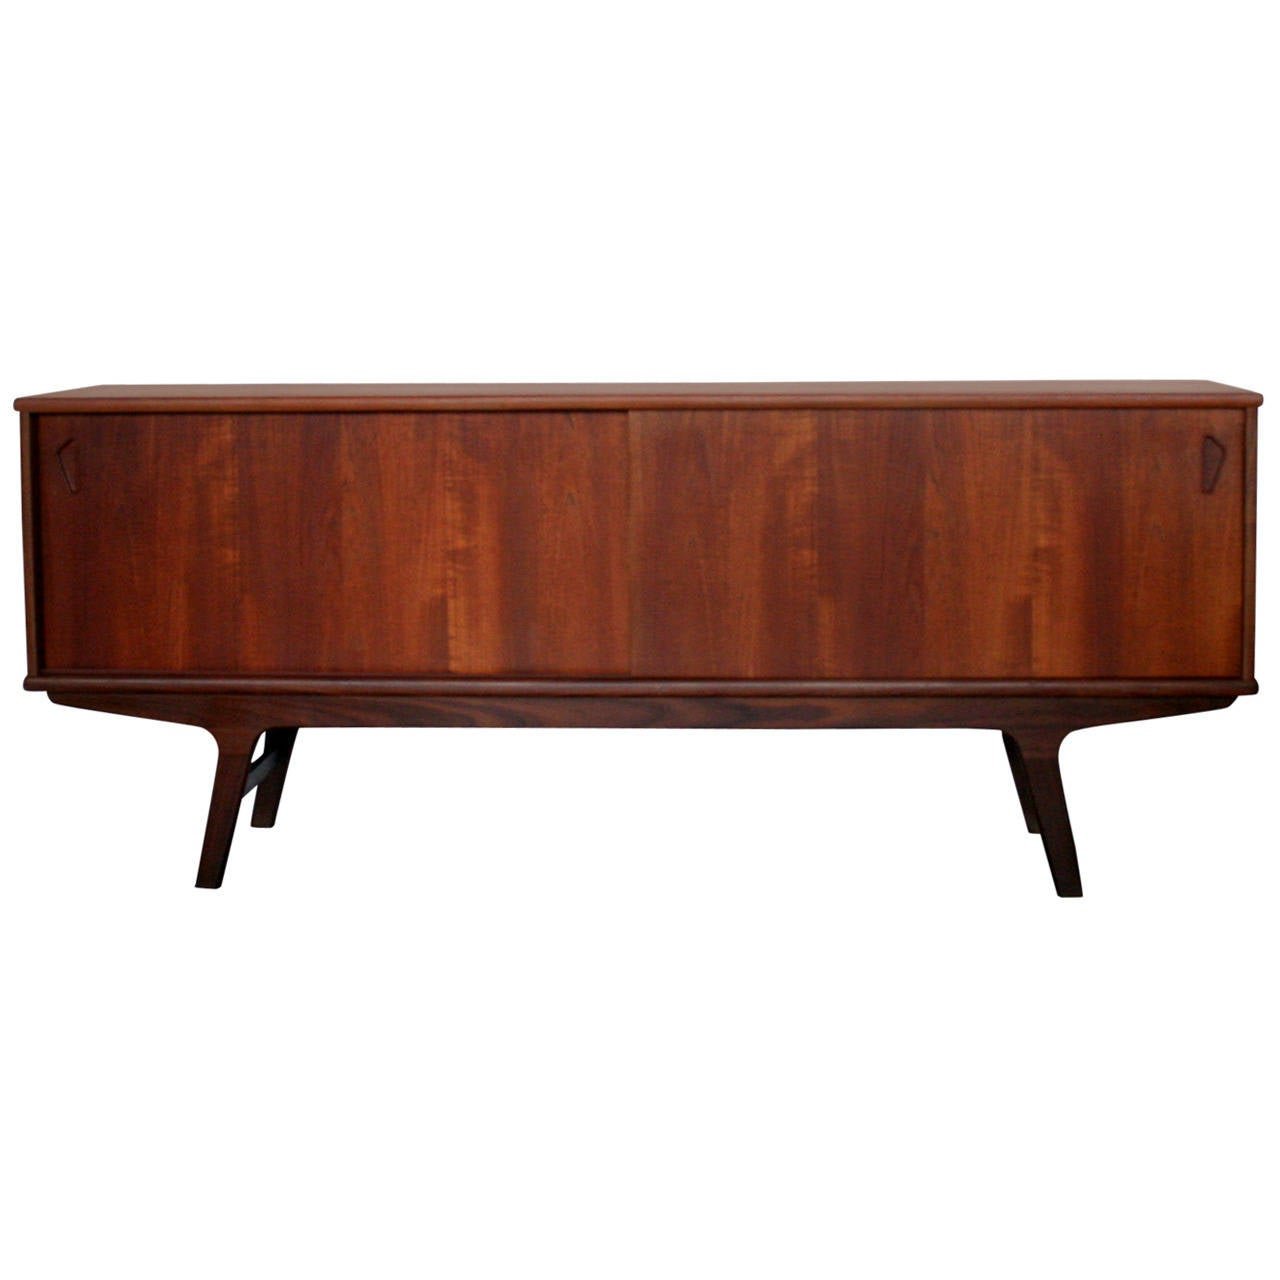 Dining Room Furniture Duncan Phyfe 1940s 9 Piece Mahogany